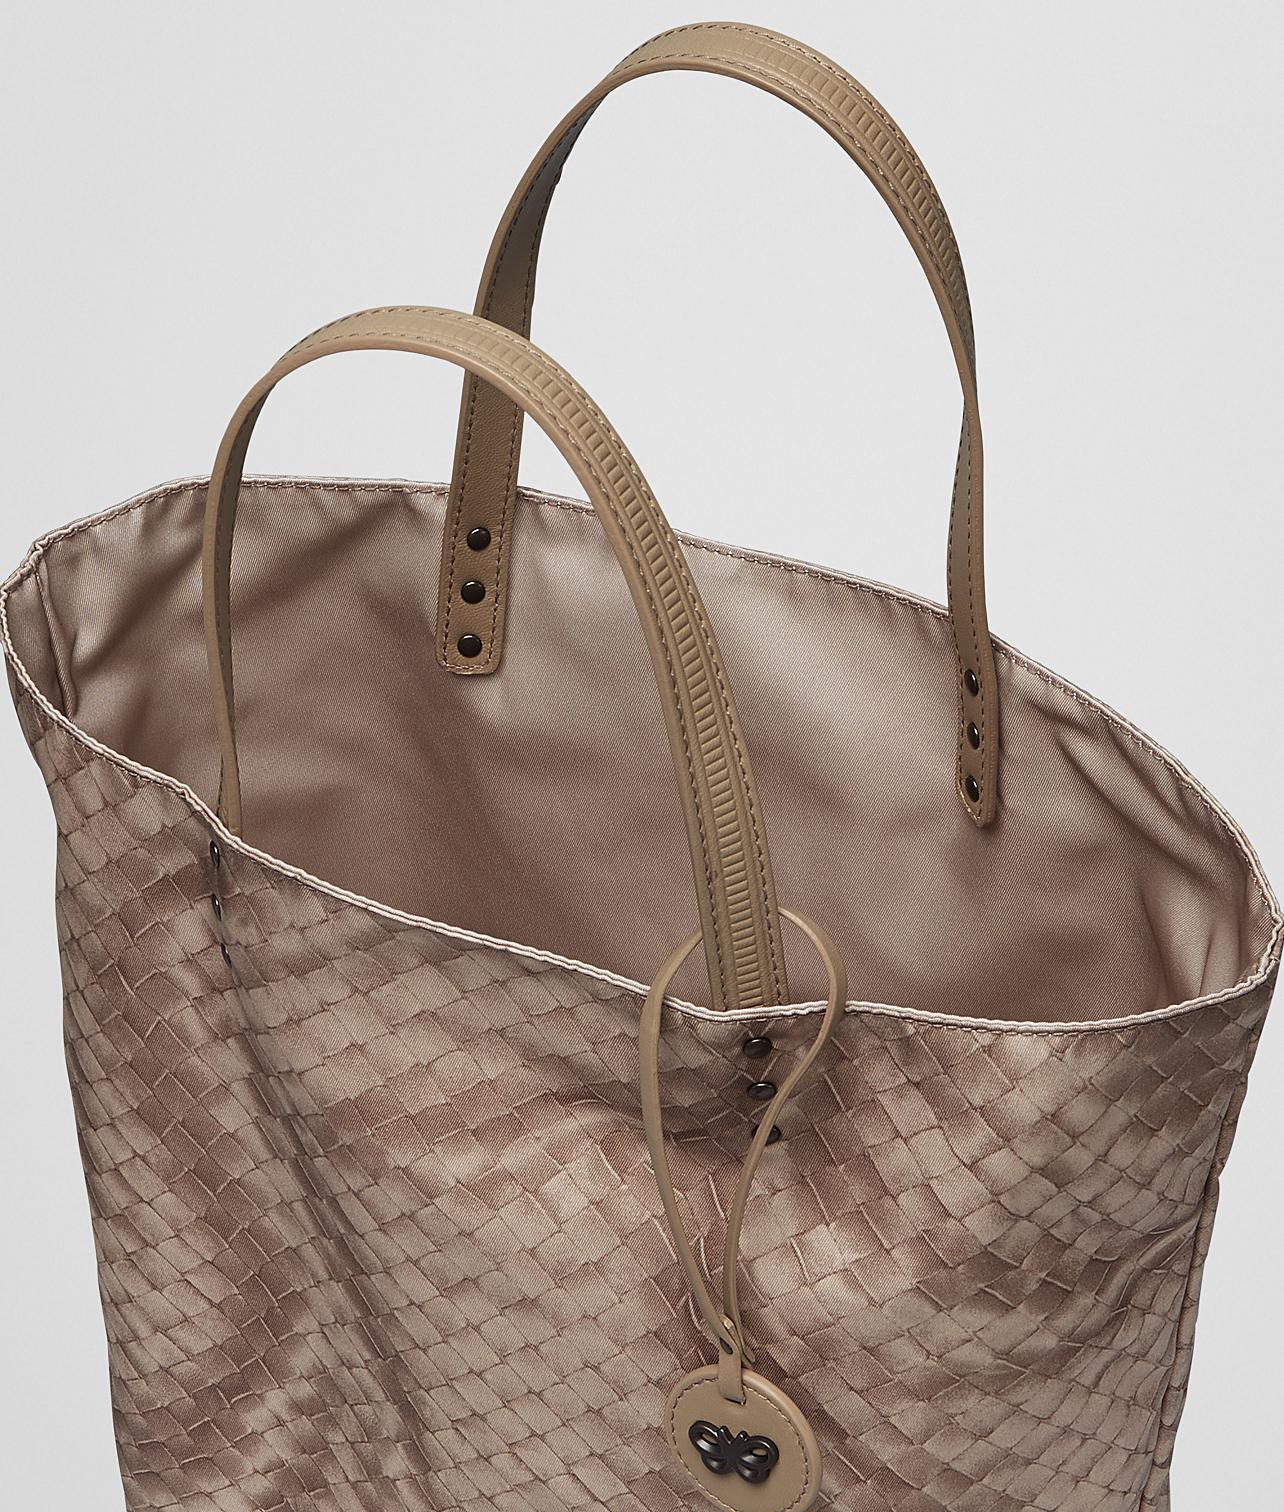 573f2d39dd Bottega veneta Sand Intrecciolusion Tote Bag in Beige (Sand)